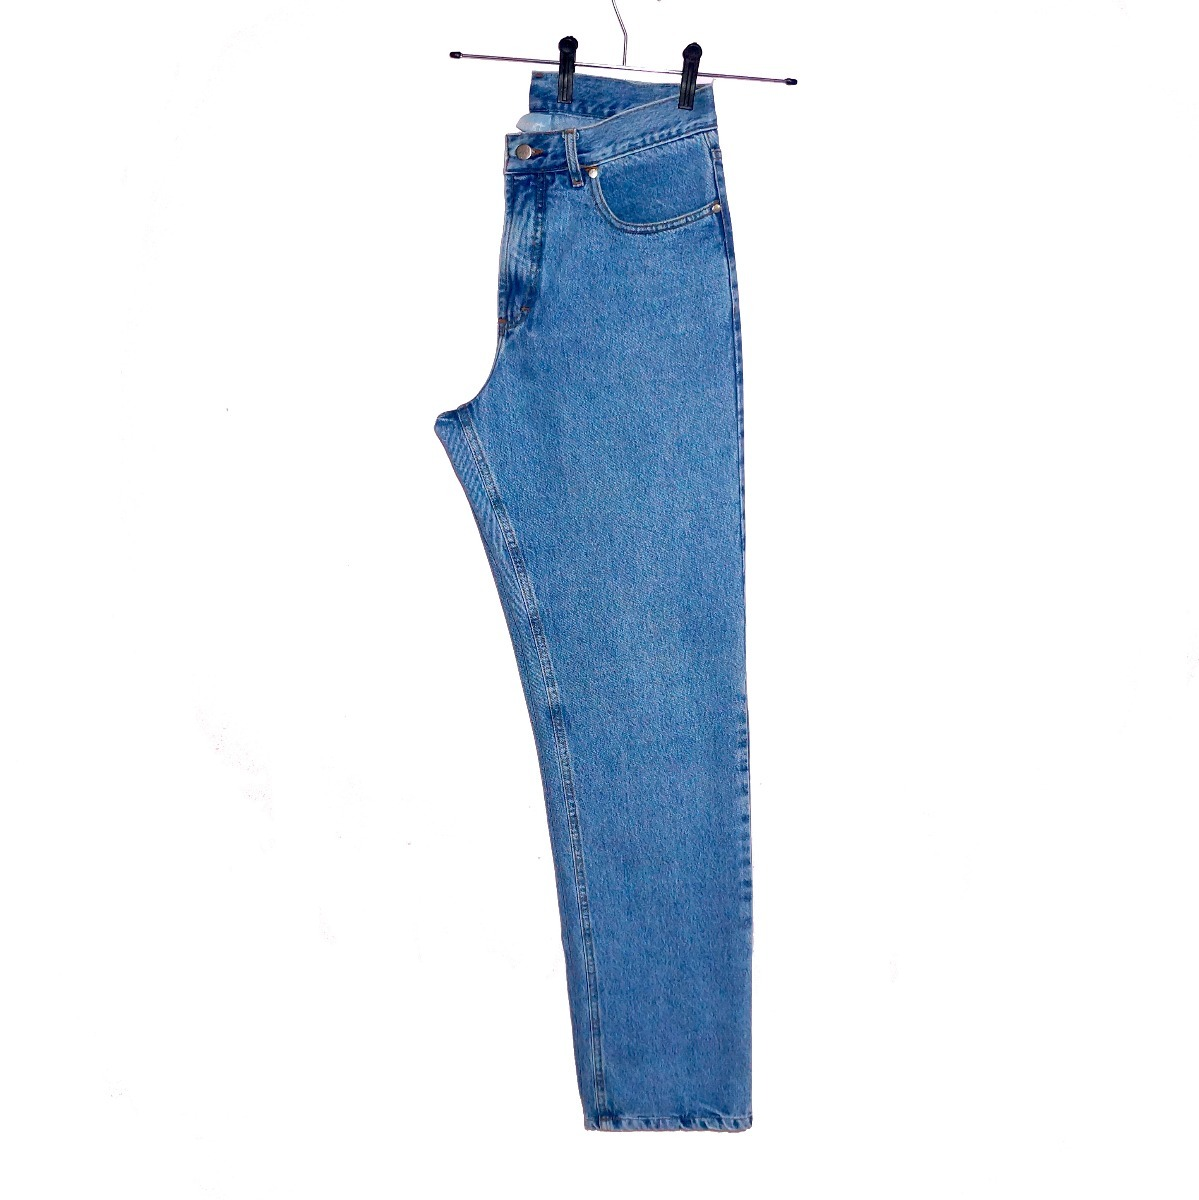 c7e9d29672 Carregando zoom... jeans jeans calça. Carregando zoom... calça mom jeans  vintage blue jeans cintura alta unisex